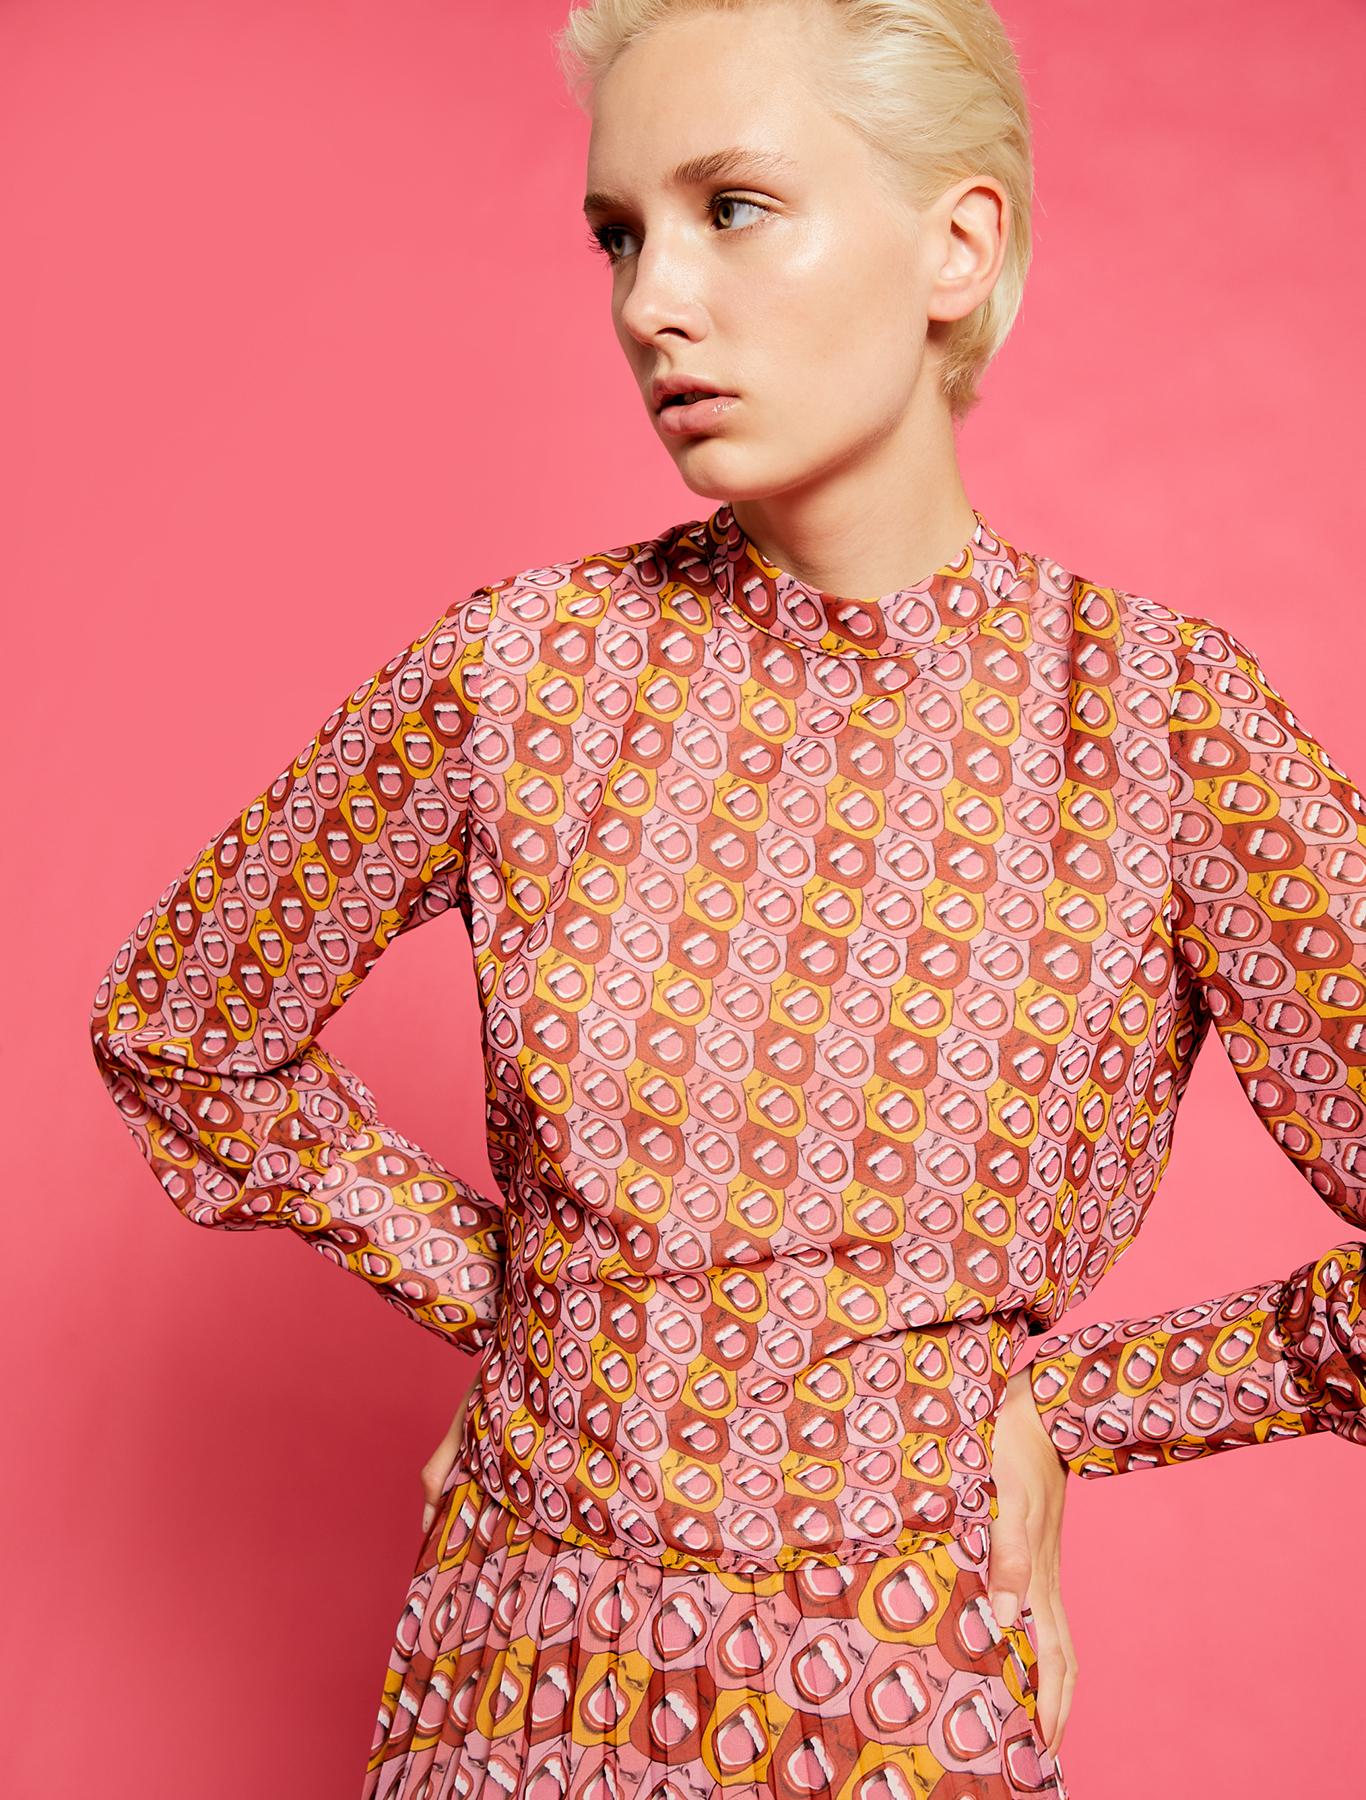 Electric Feel by Spiros Halaris Georgette blouse - coral pattern - pennyblack